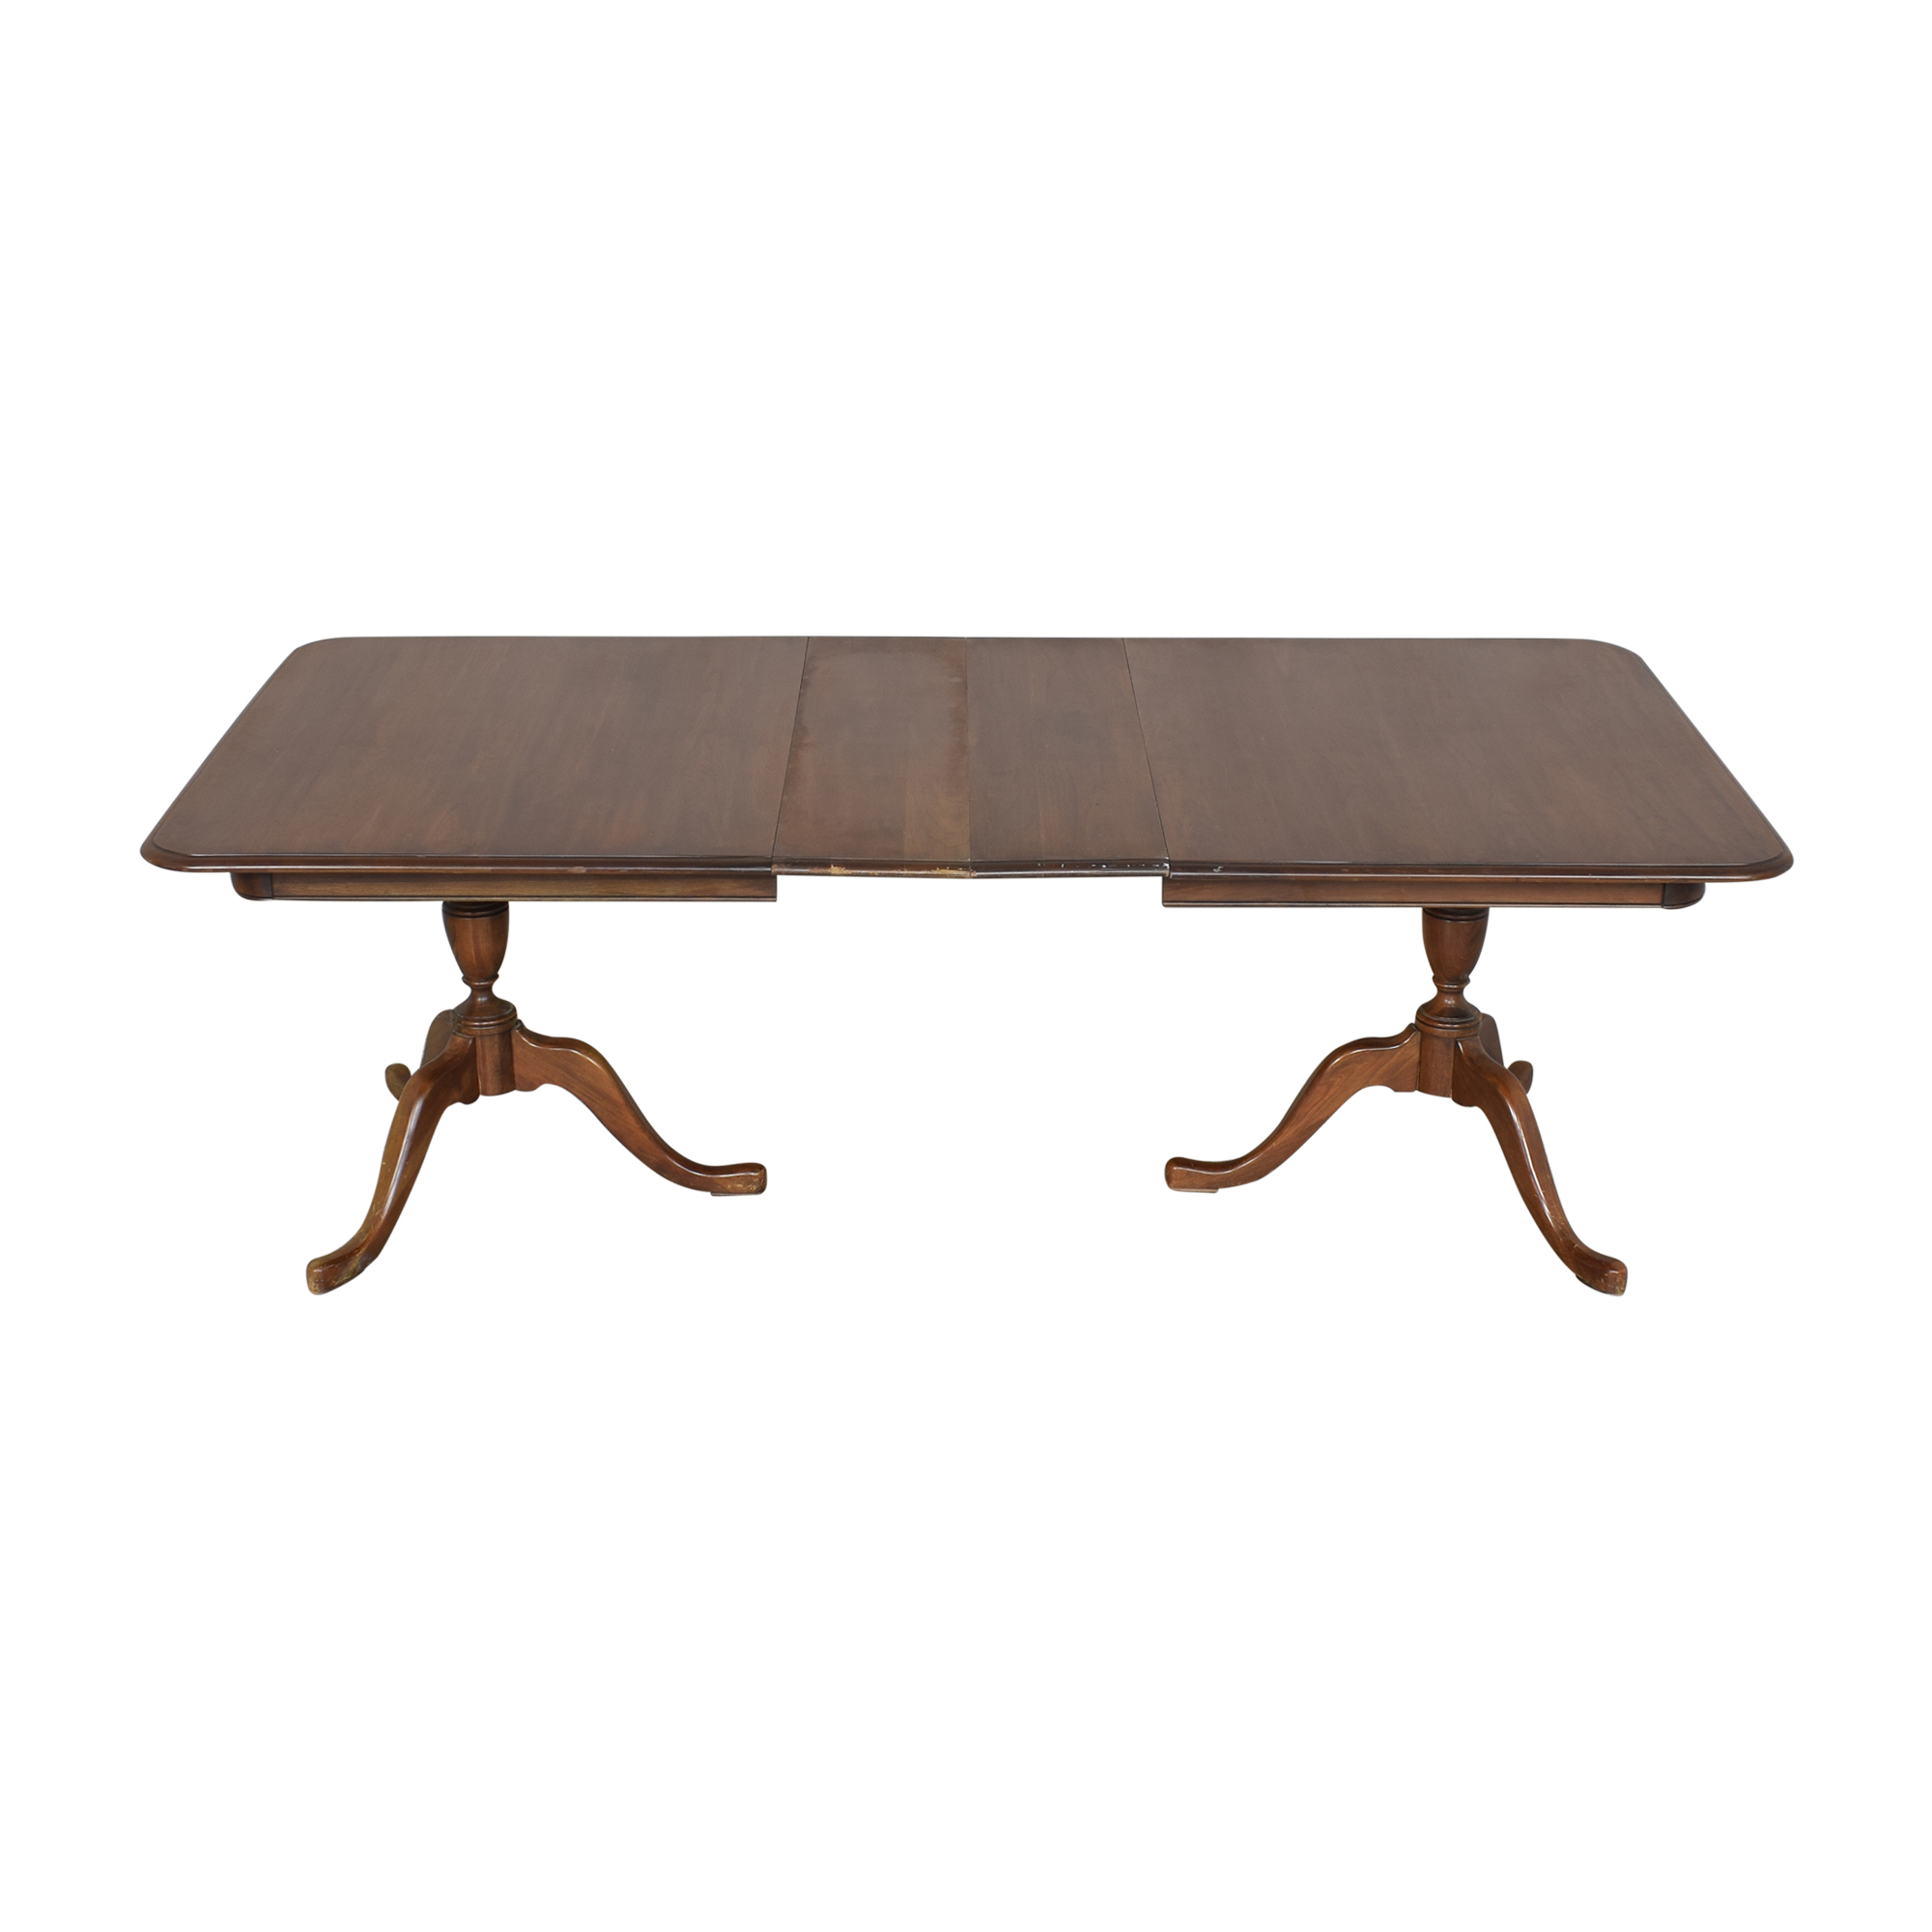 buy Pennsylvania House Pennsylvania House Double Pedestal Dining Table online